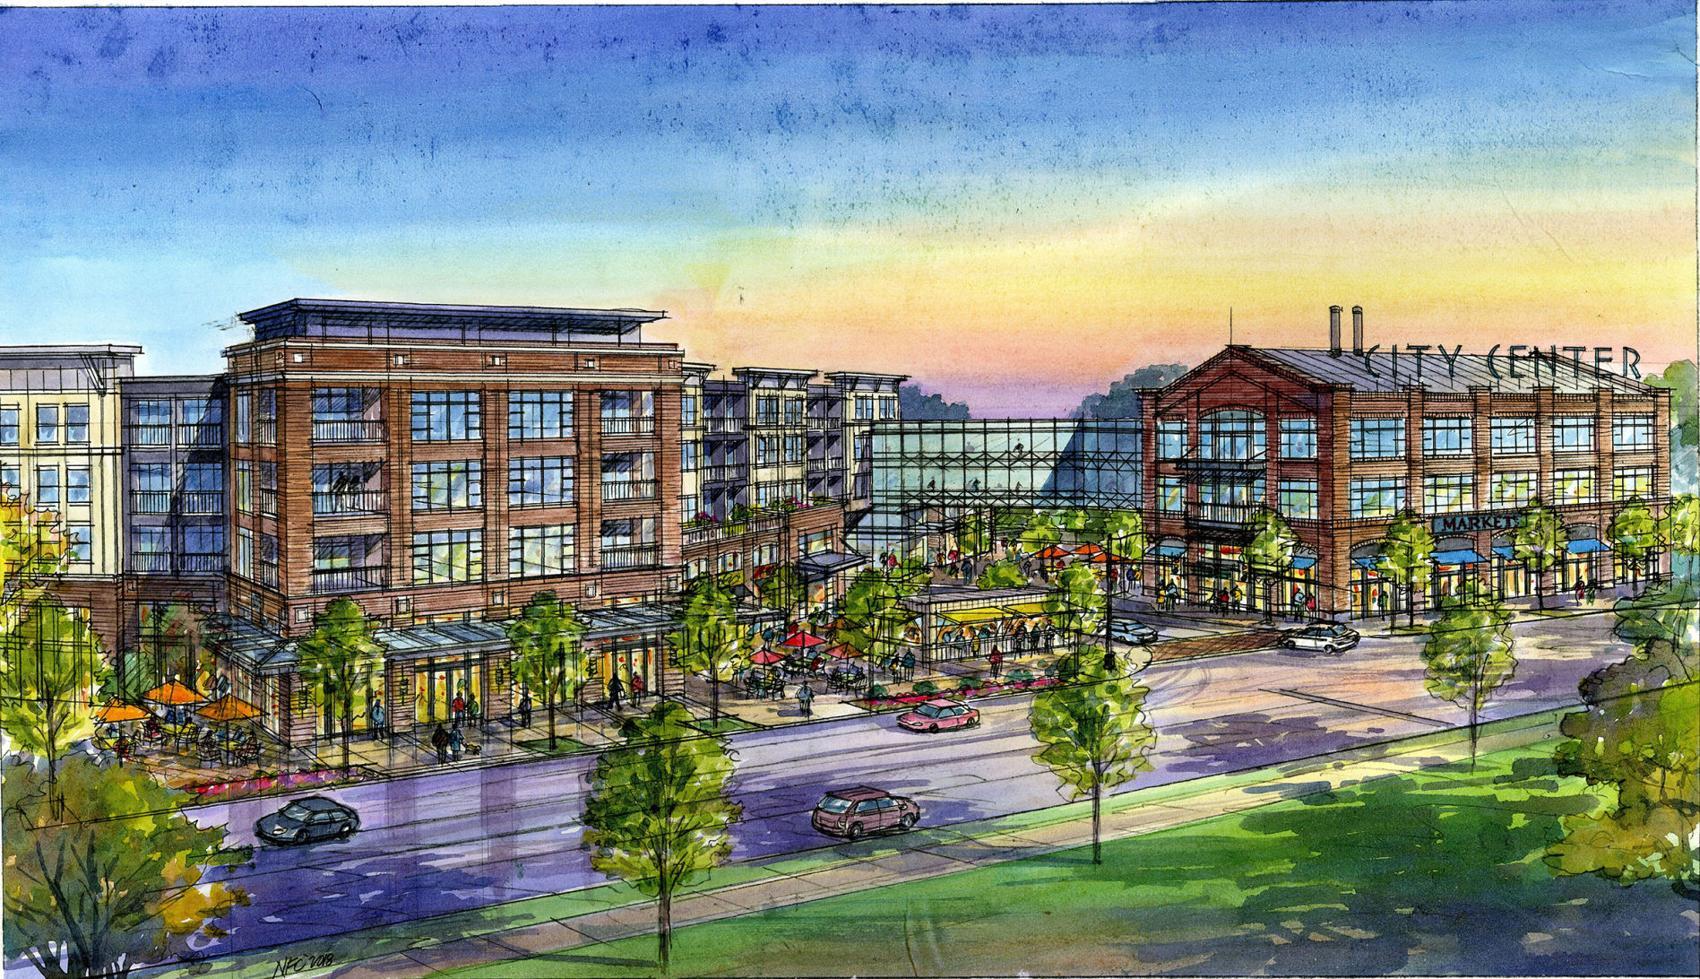 SJ Collins rendering of Southern Skillet Plaza